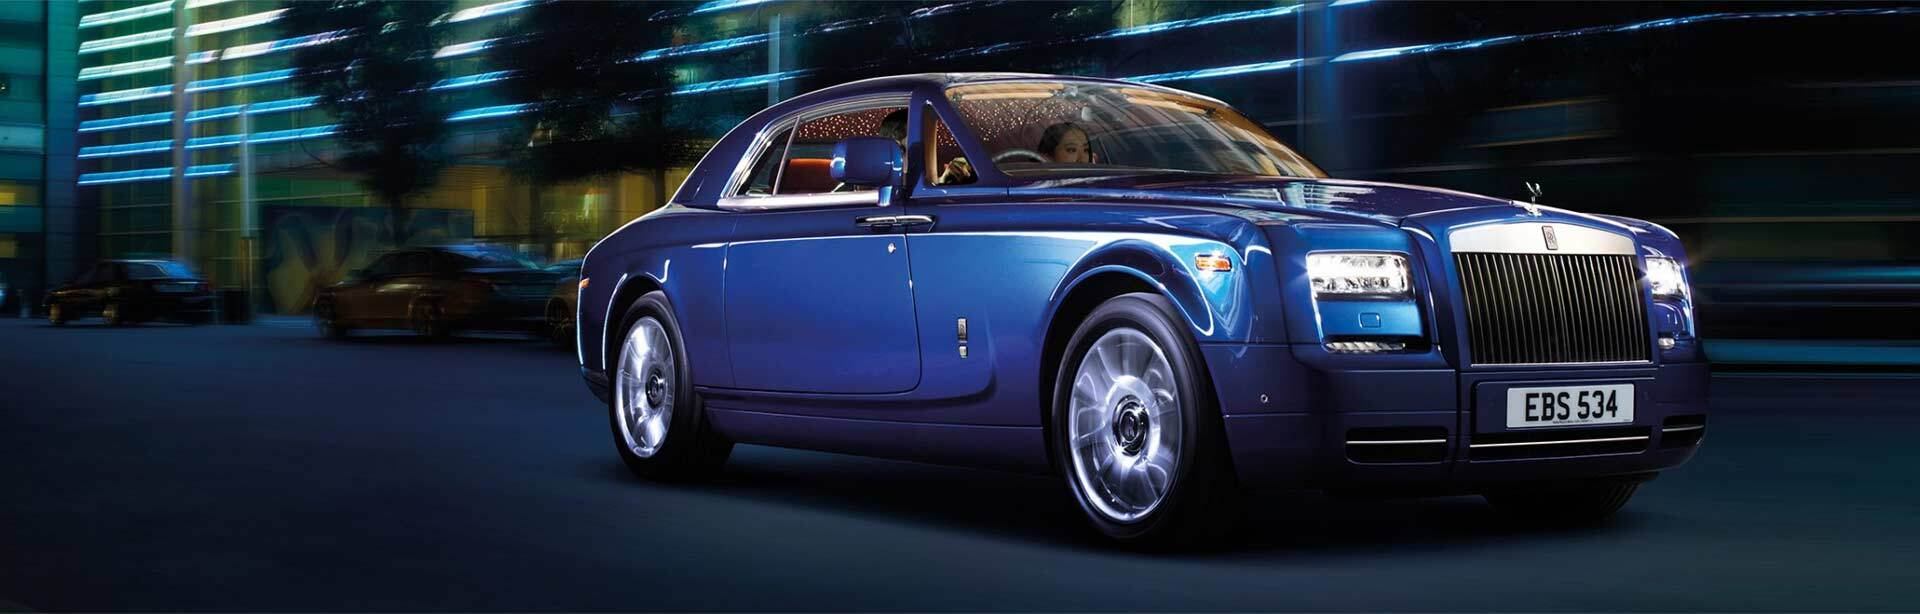 Los Gatos Luxury Cars New Amp Used Cars Auto Dealer